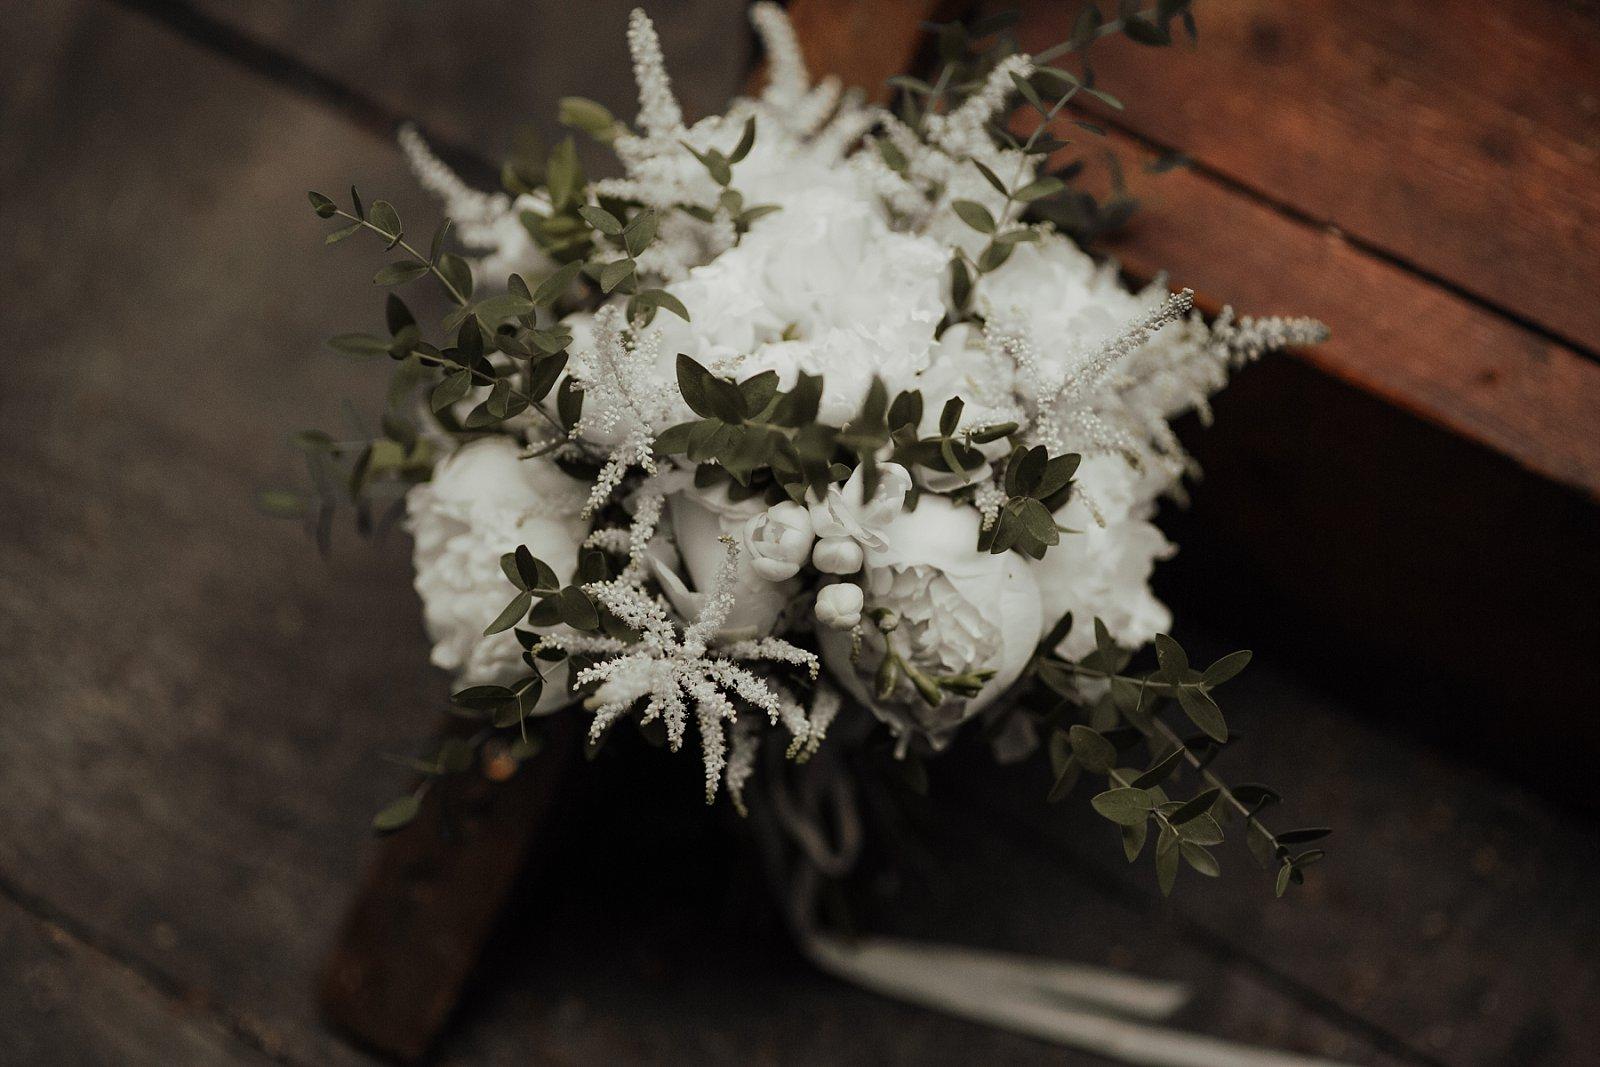 boho-industrial-wedding-bucharest-maison-dadoo-liaandlau